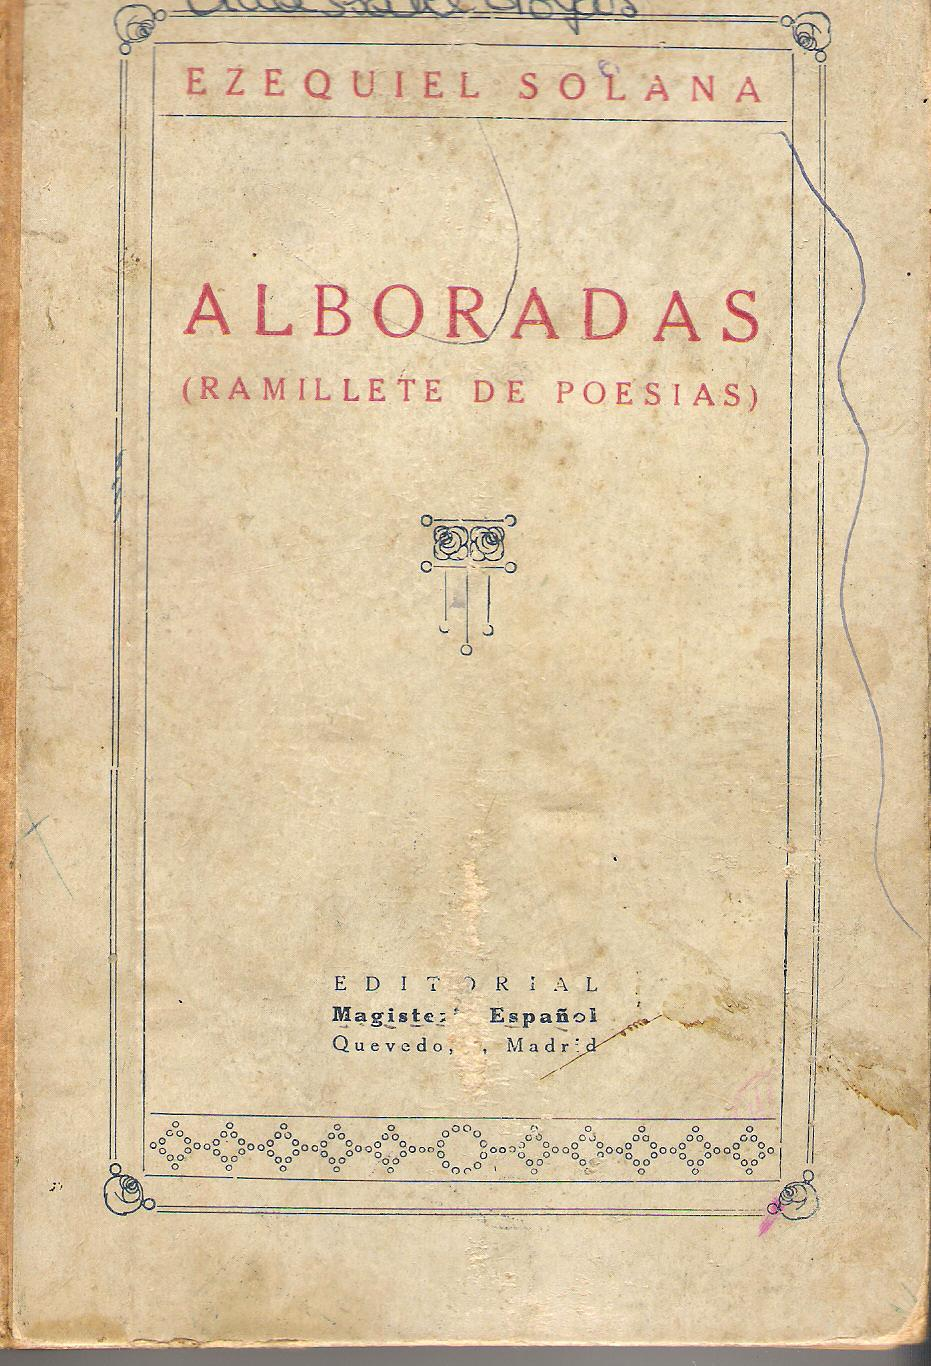 Alboradas